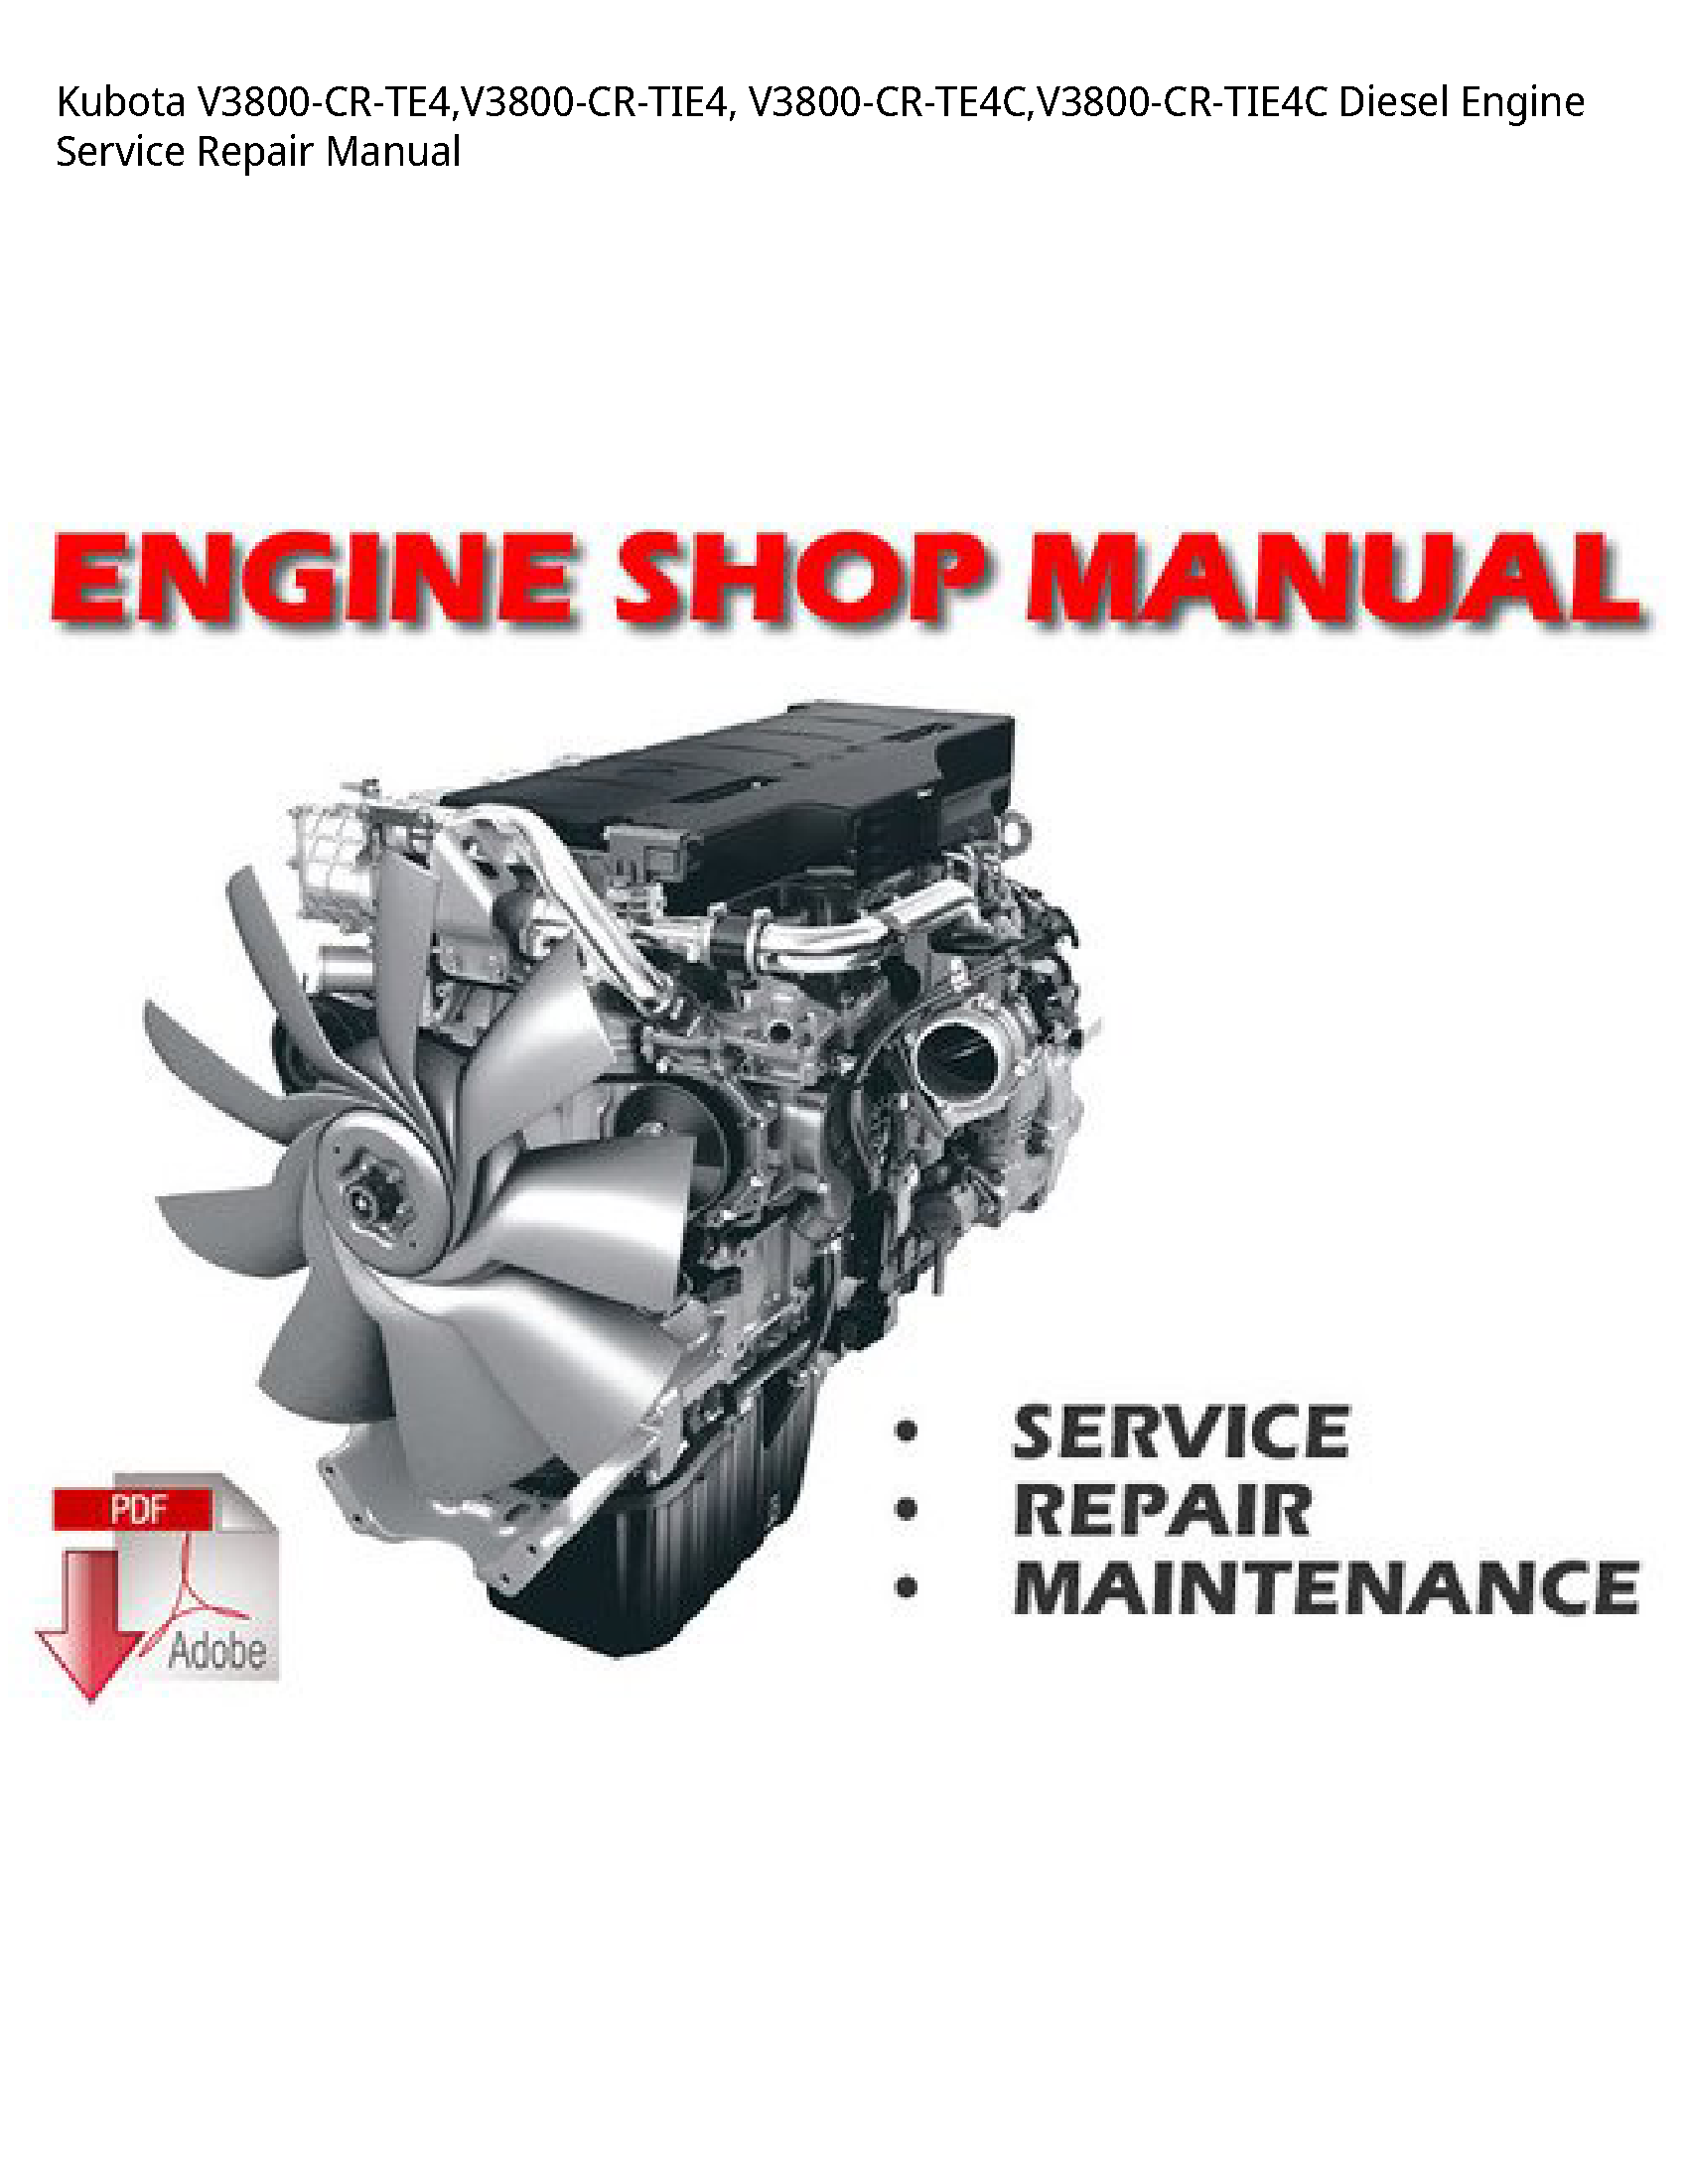 Kubota V3800-CR-TE4 Diesel Engine manual